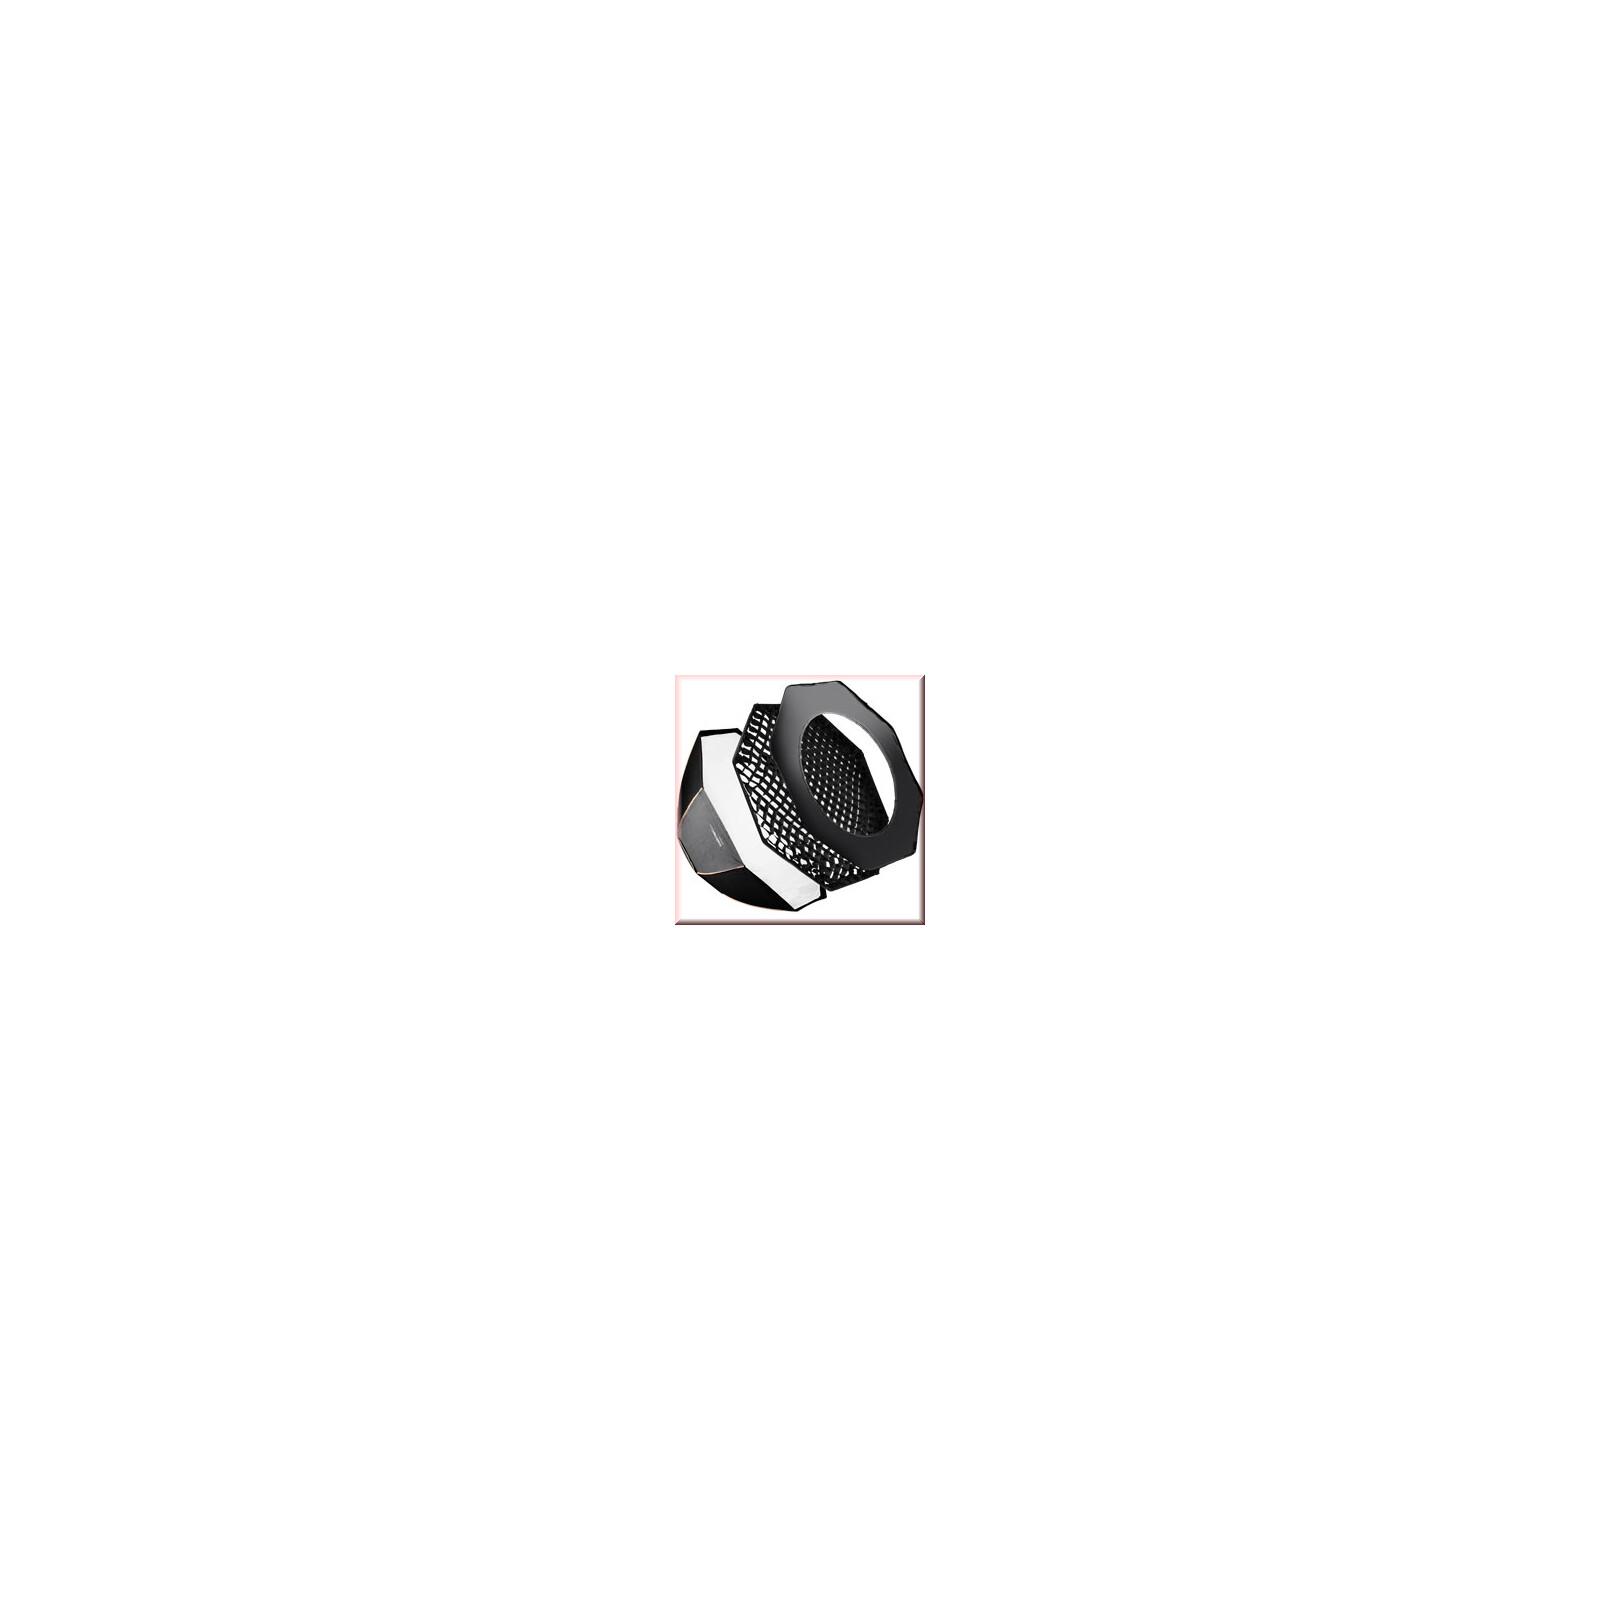 walimex pro Octa Softbox PLUS OL Ø213 Multiblitz V